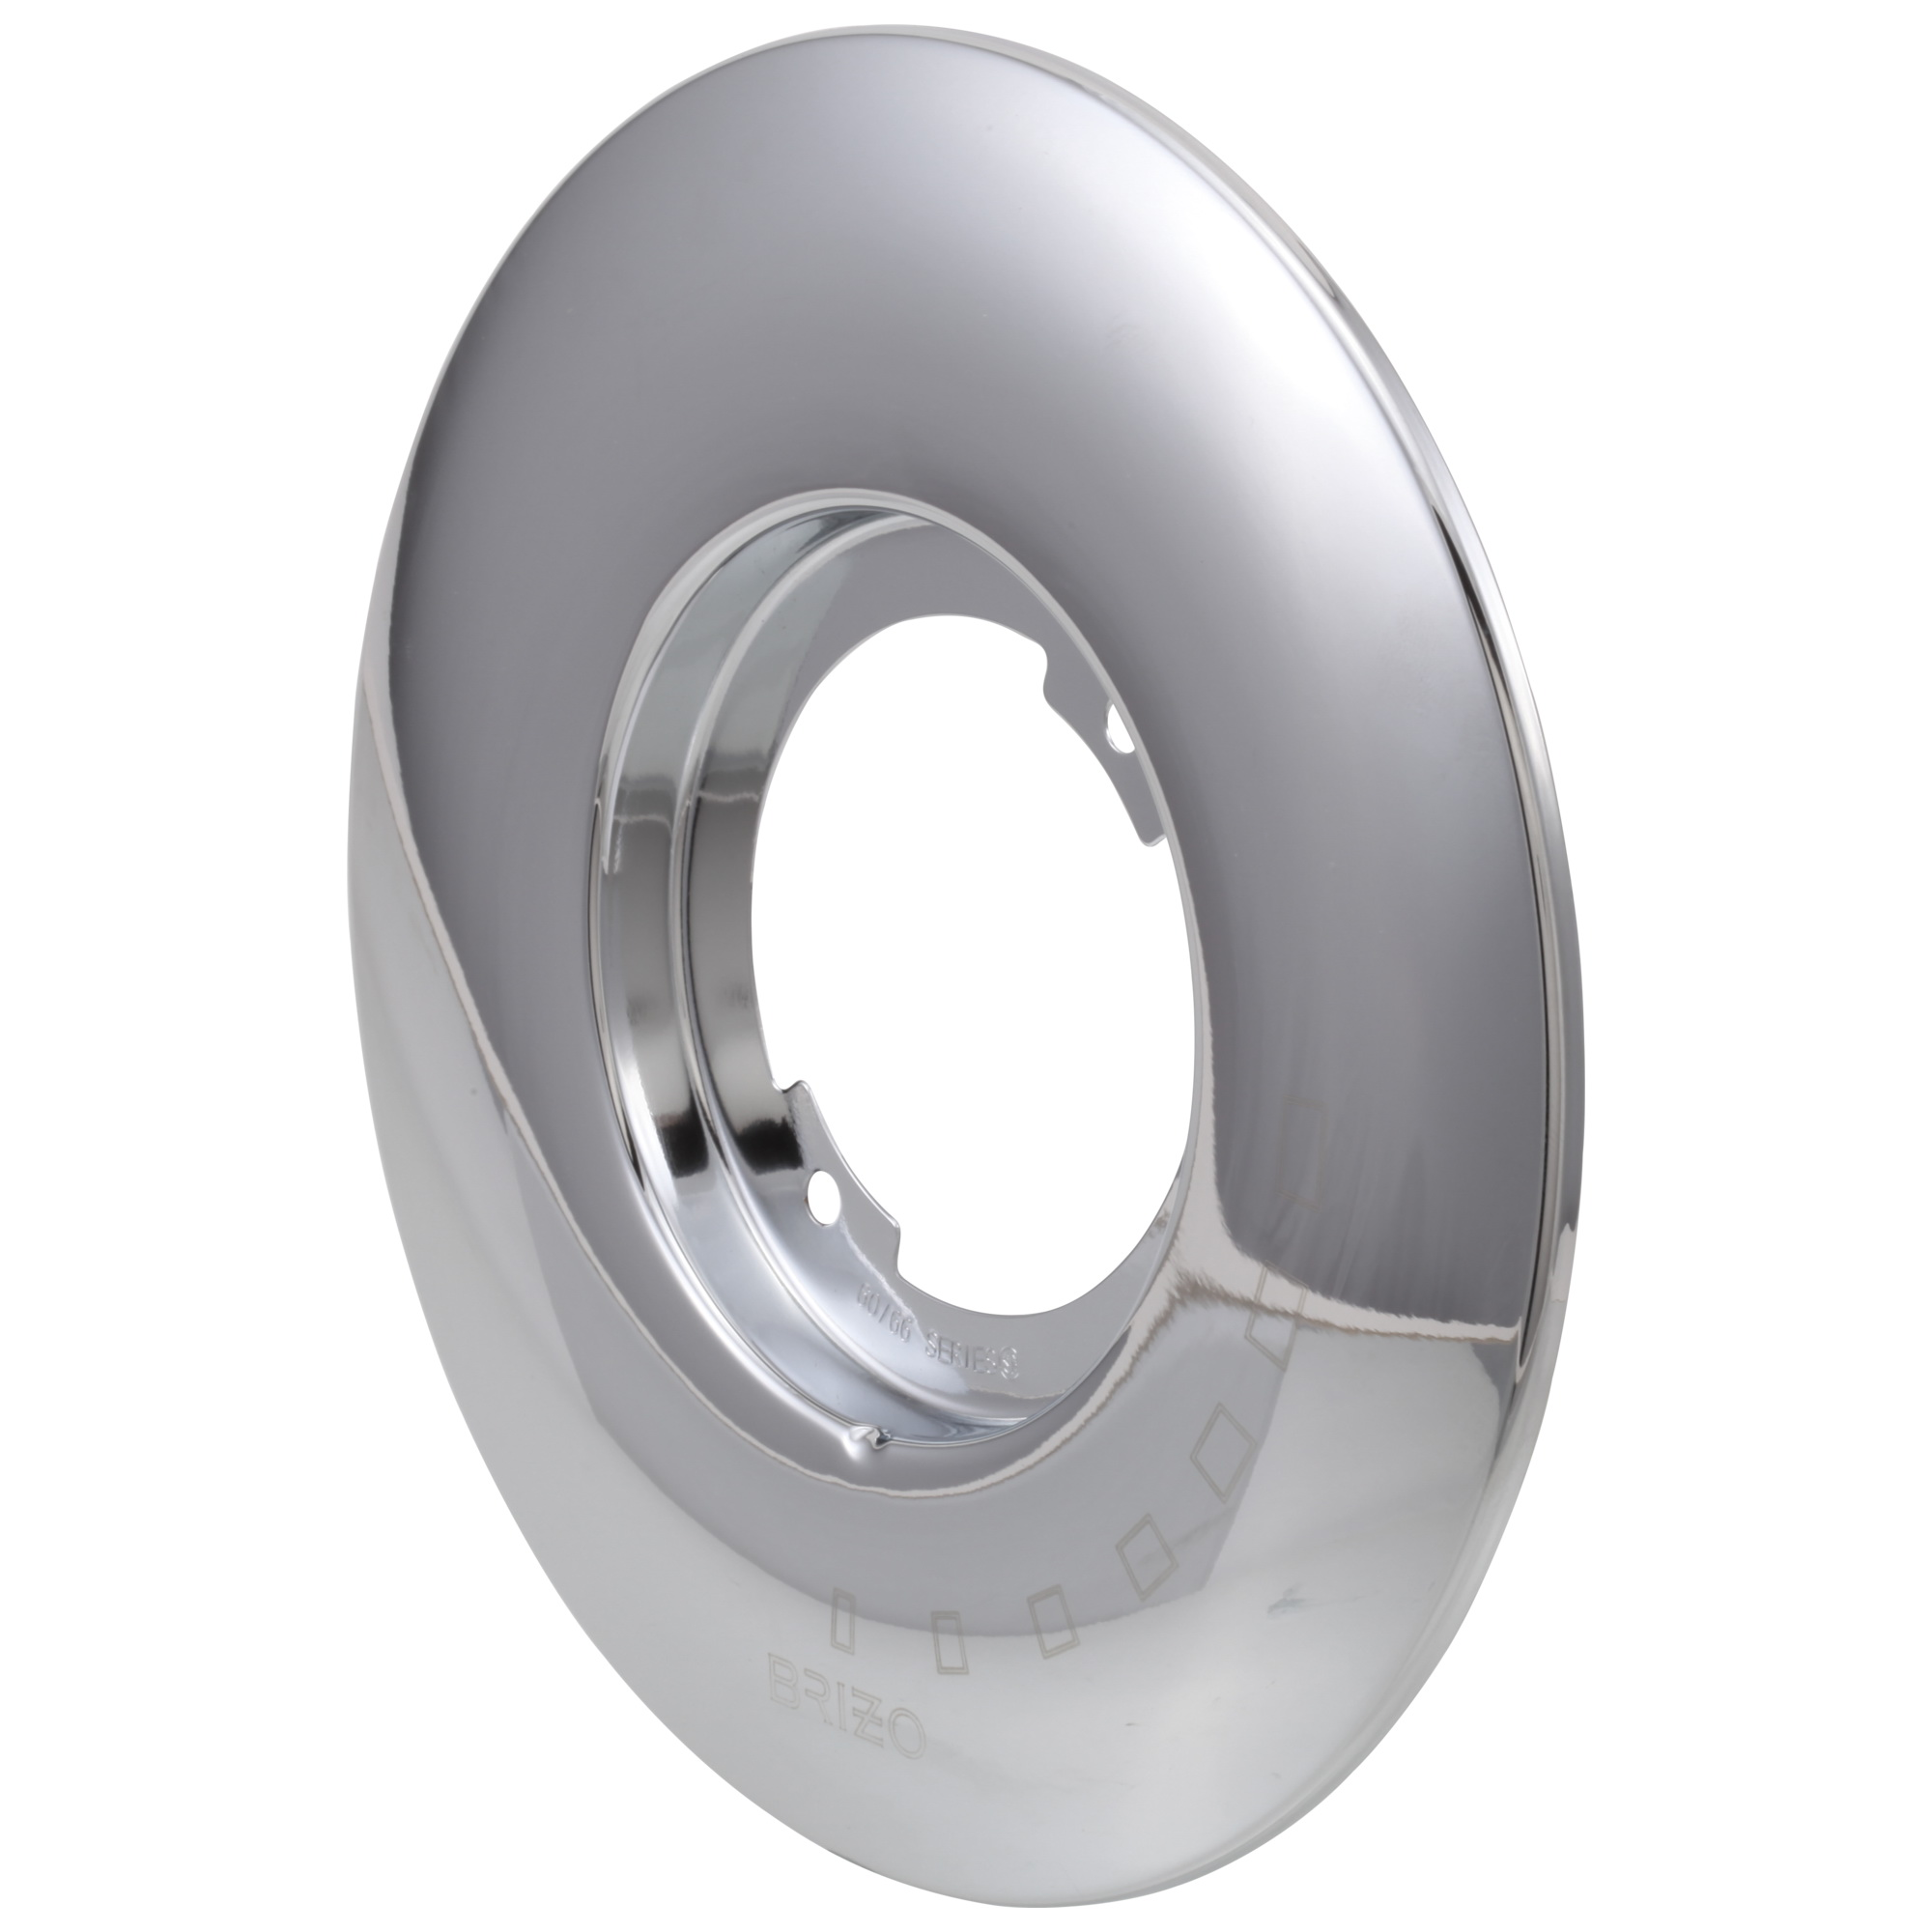 Brizo® RP49346PC RSVP® Tub and Shower Escutcheon, Chrome Plated, Import